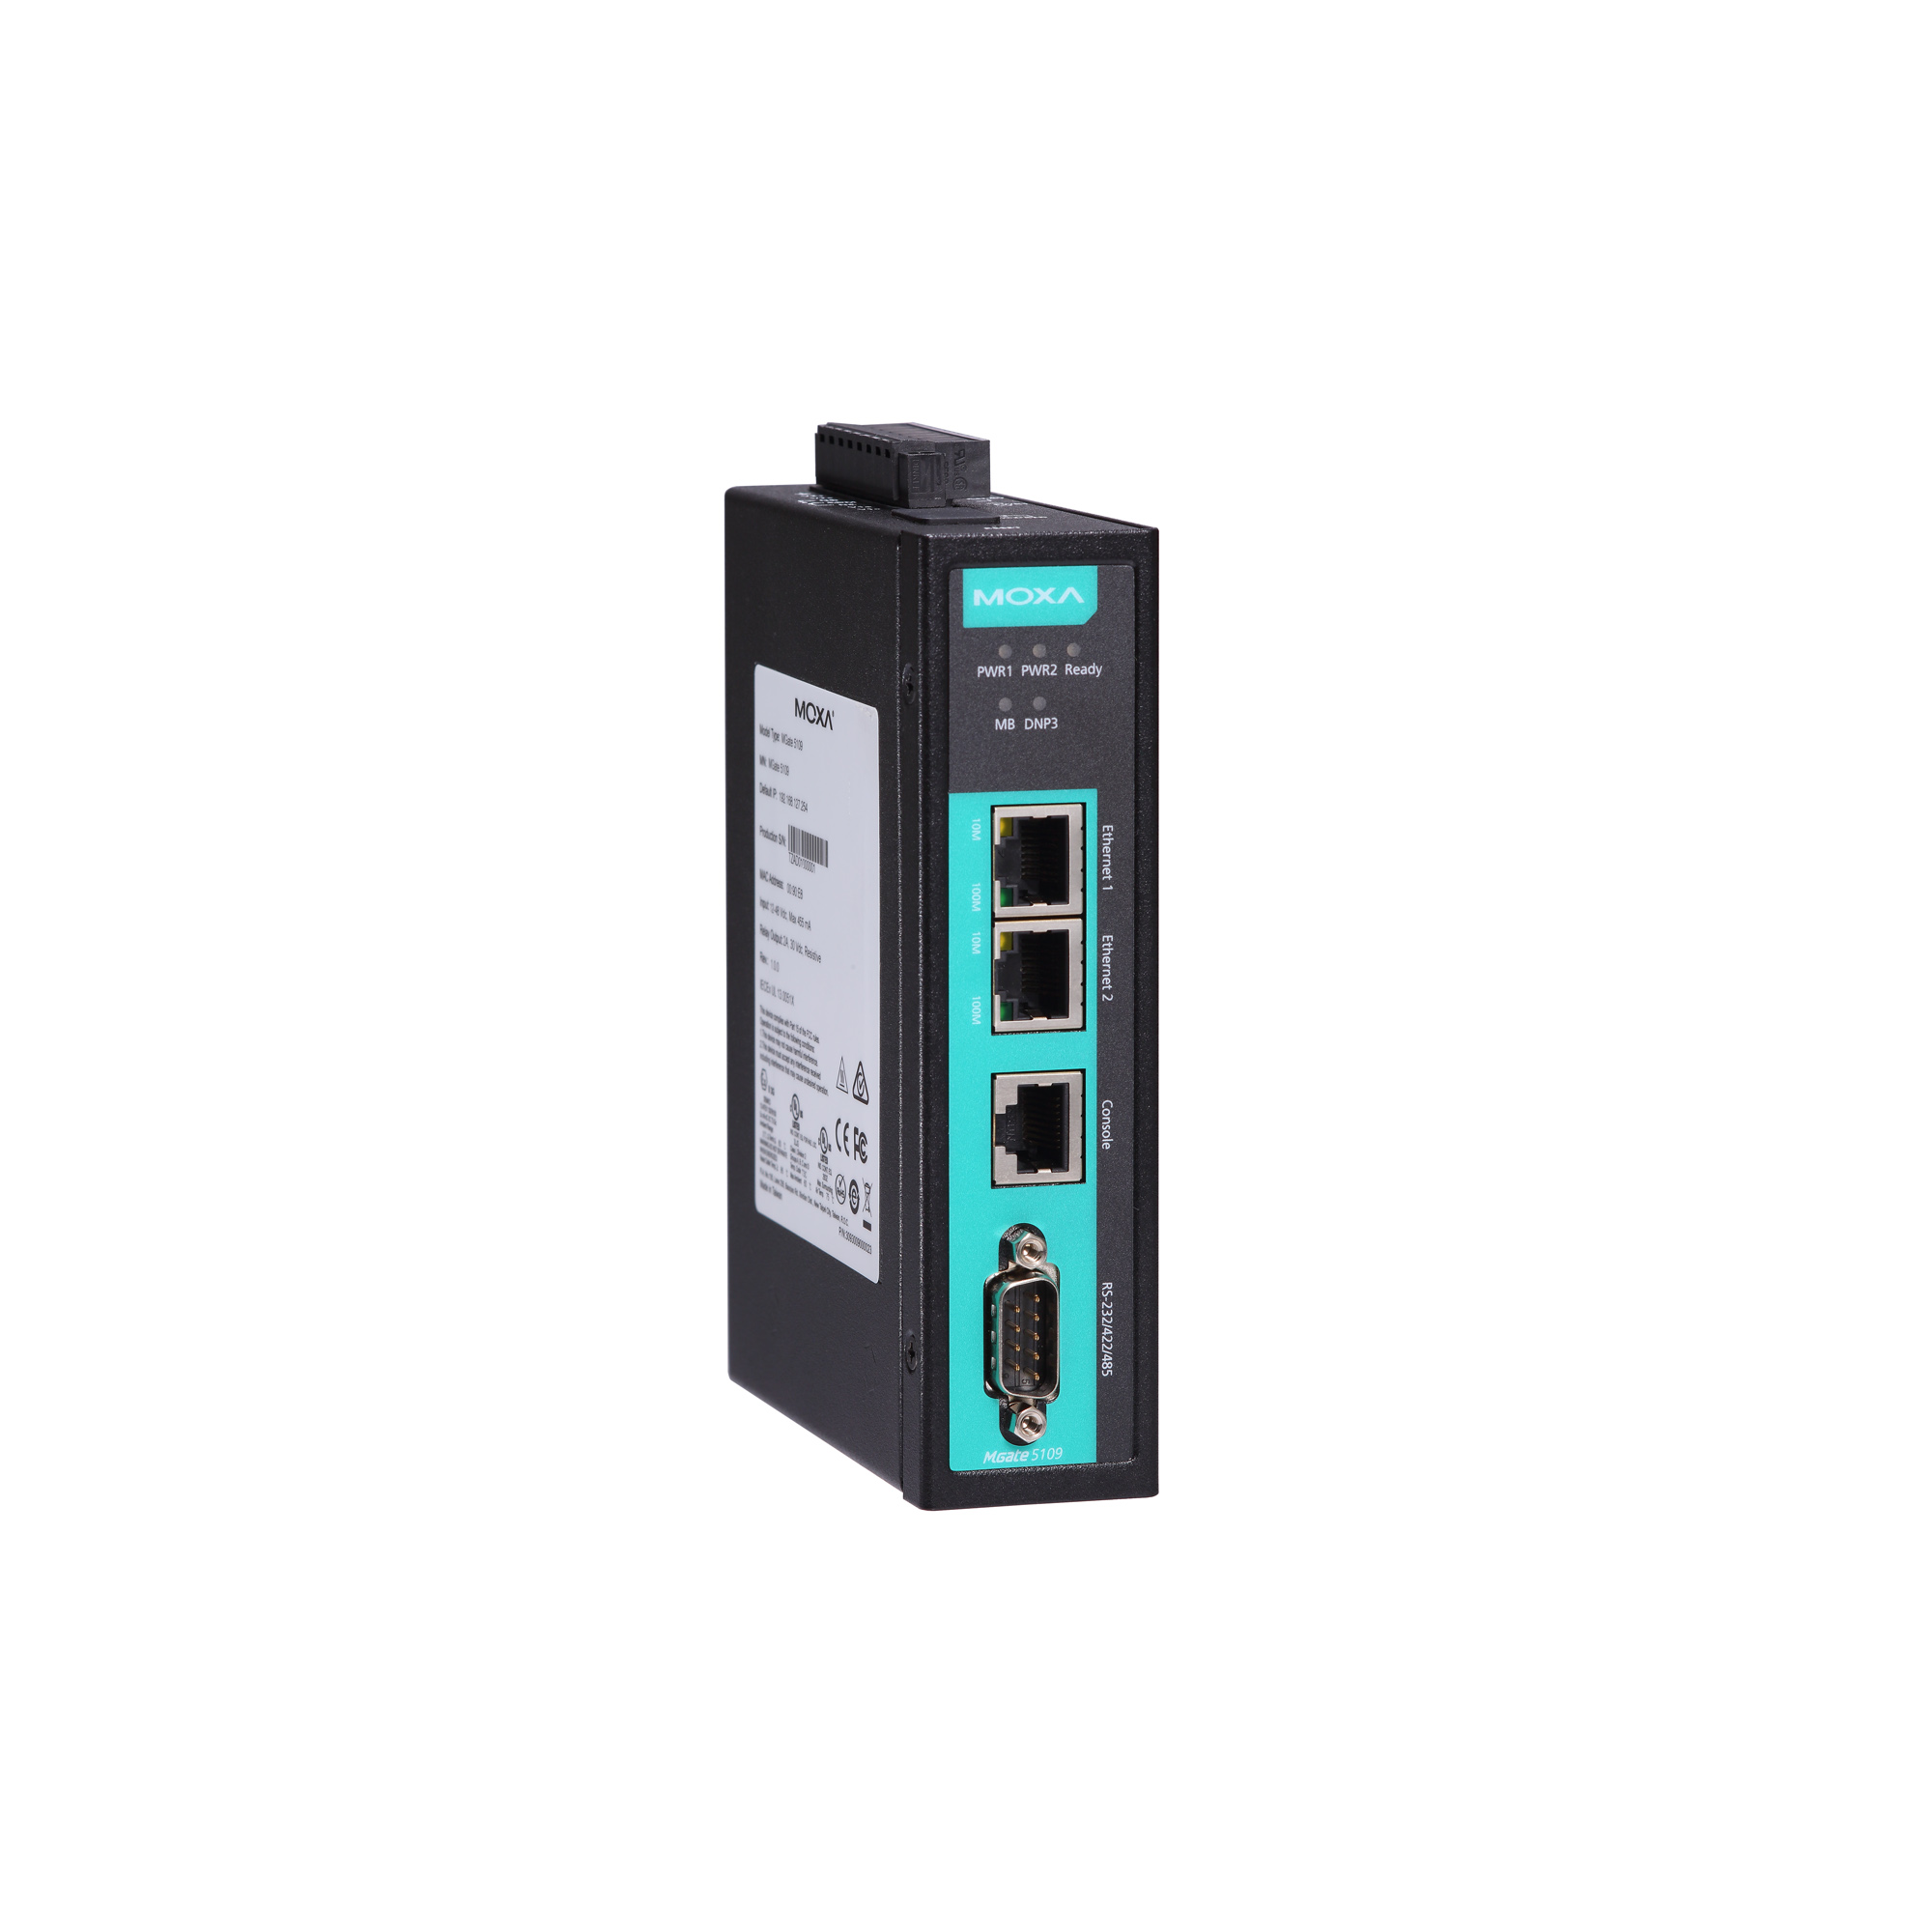 MGate 5109 Series - Modbus TCP Gateways | MOXA